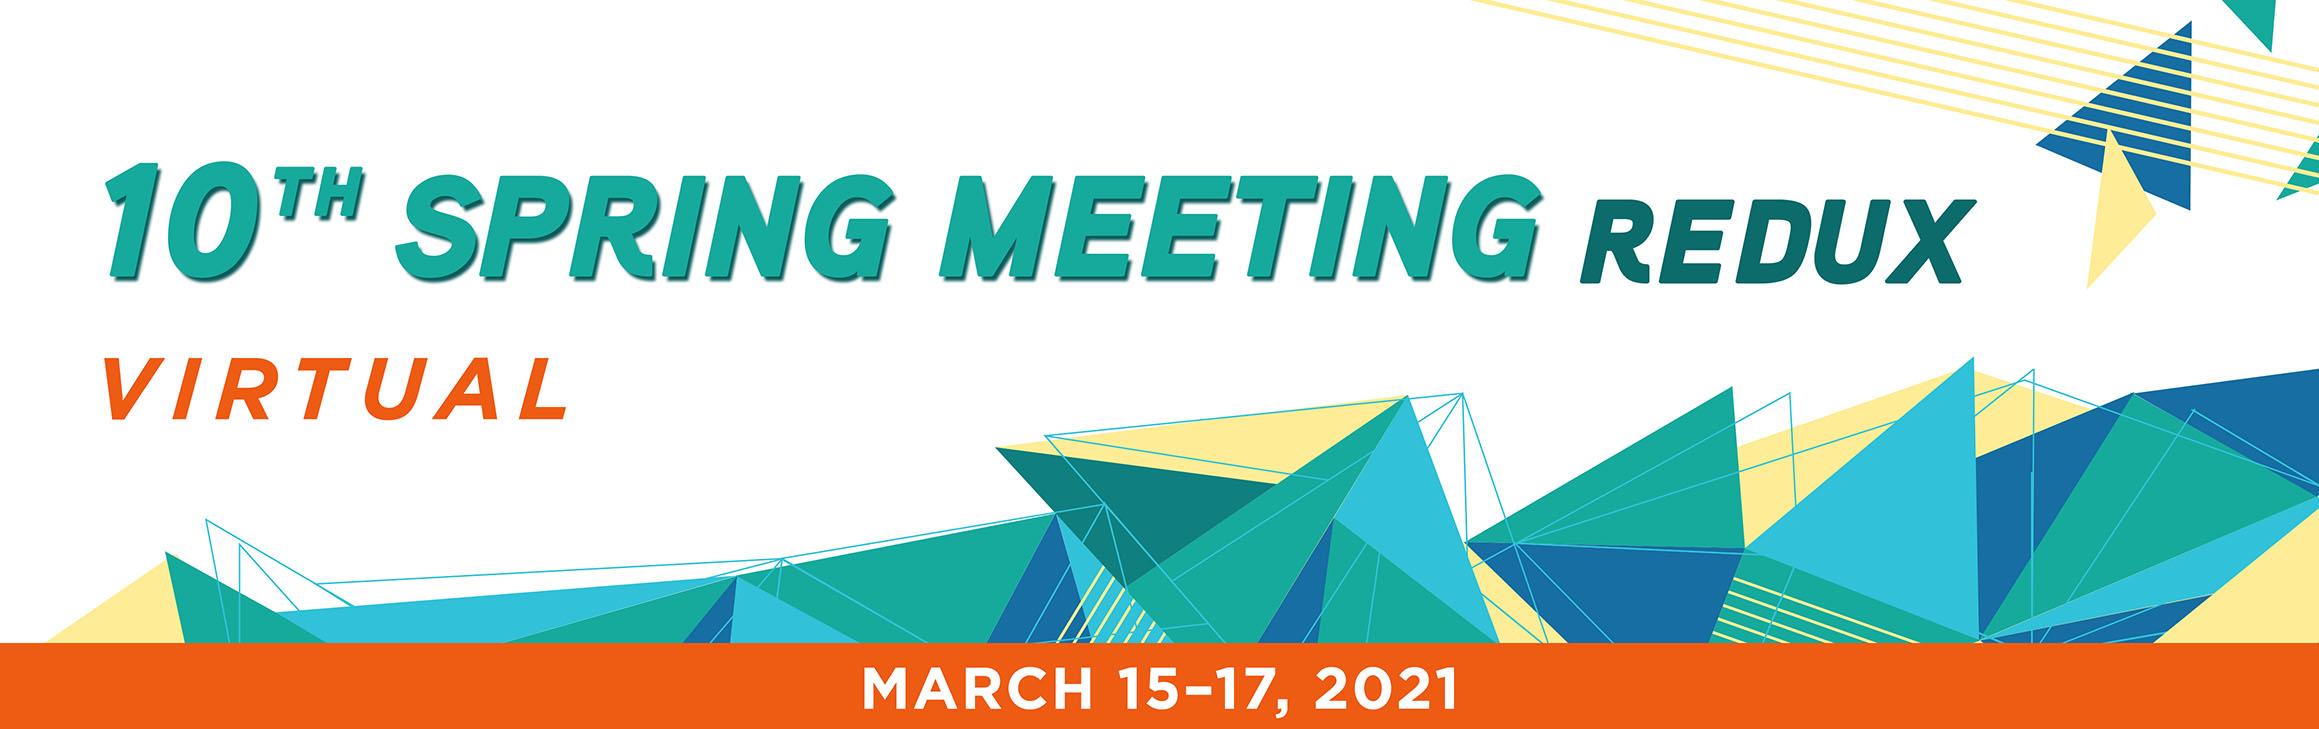 10th Spring Meeting Redux